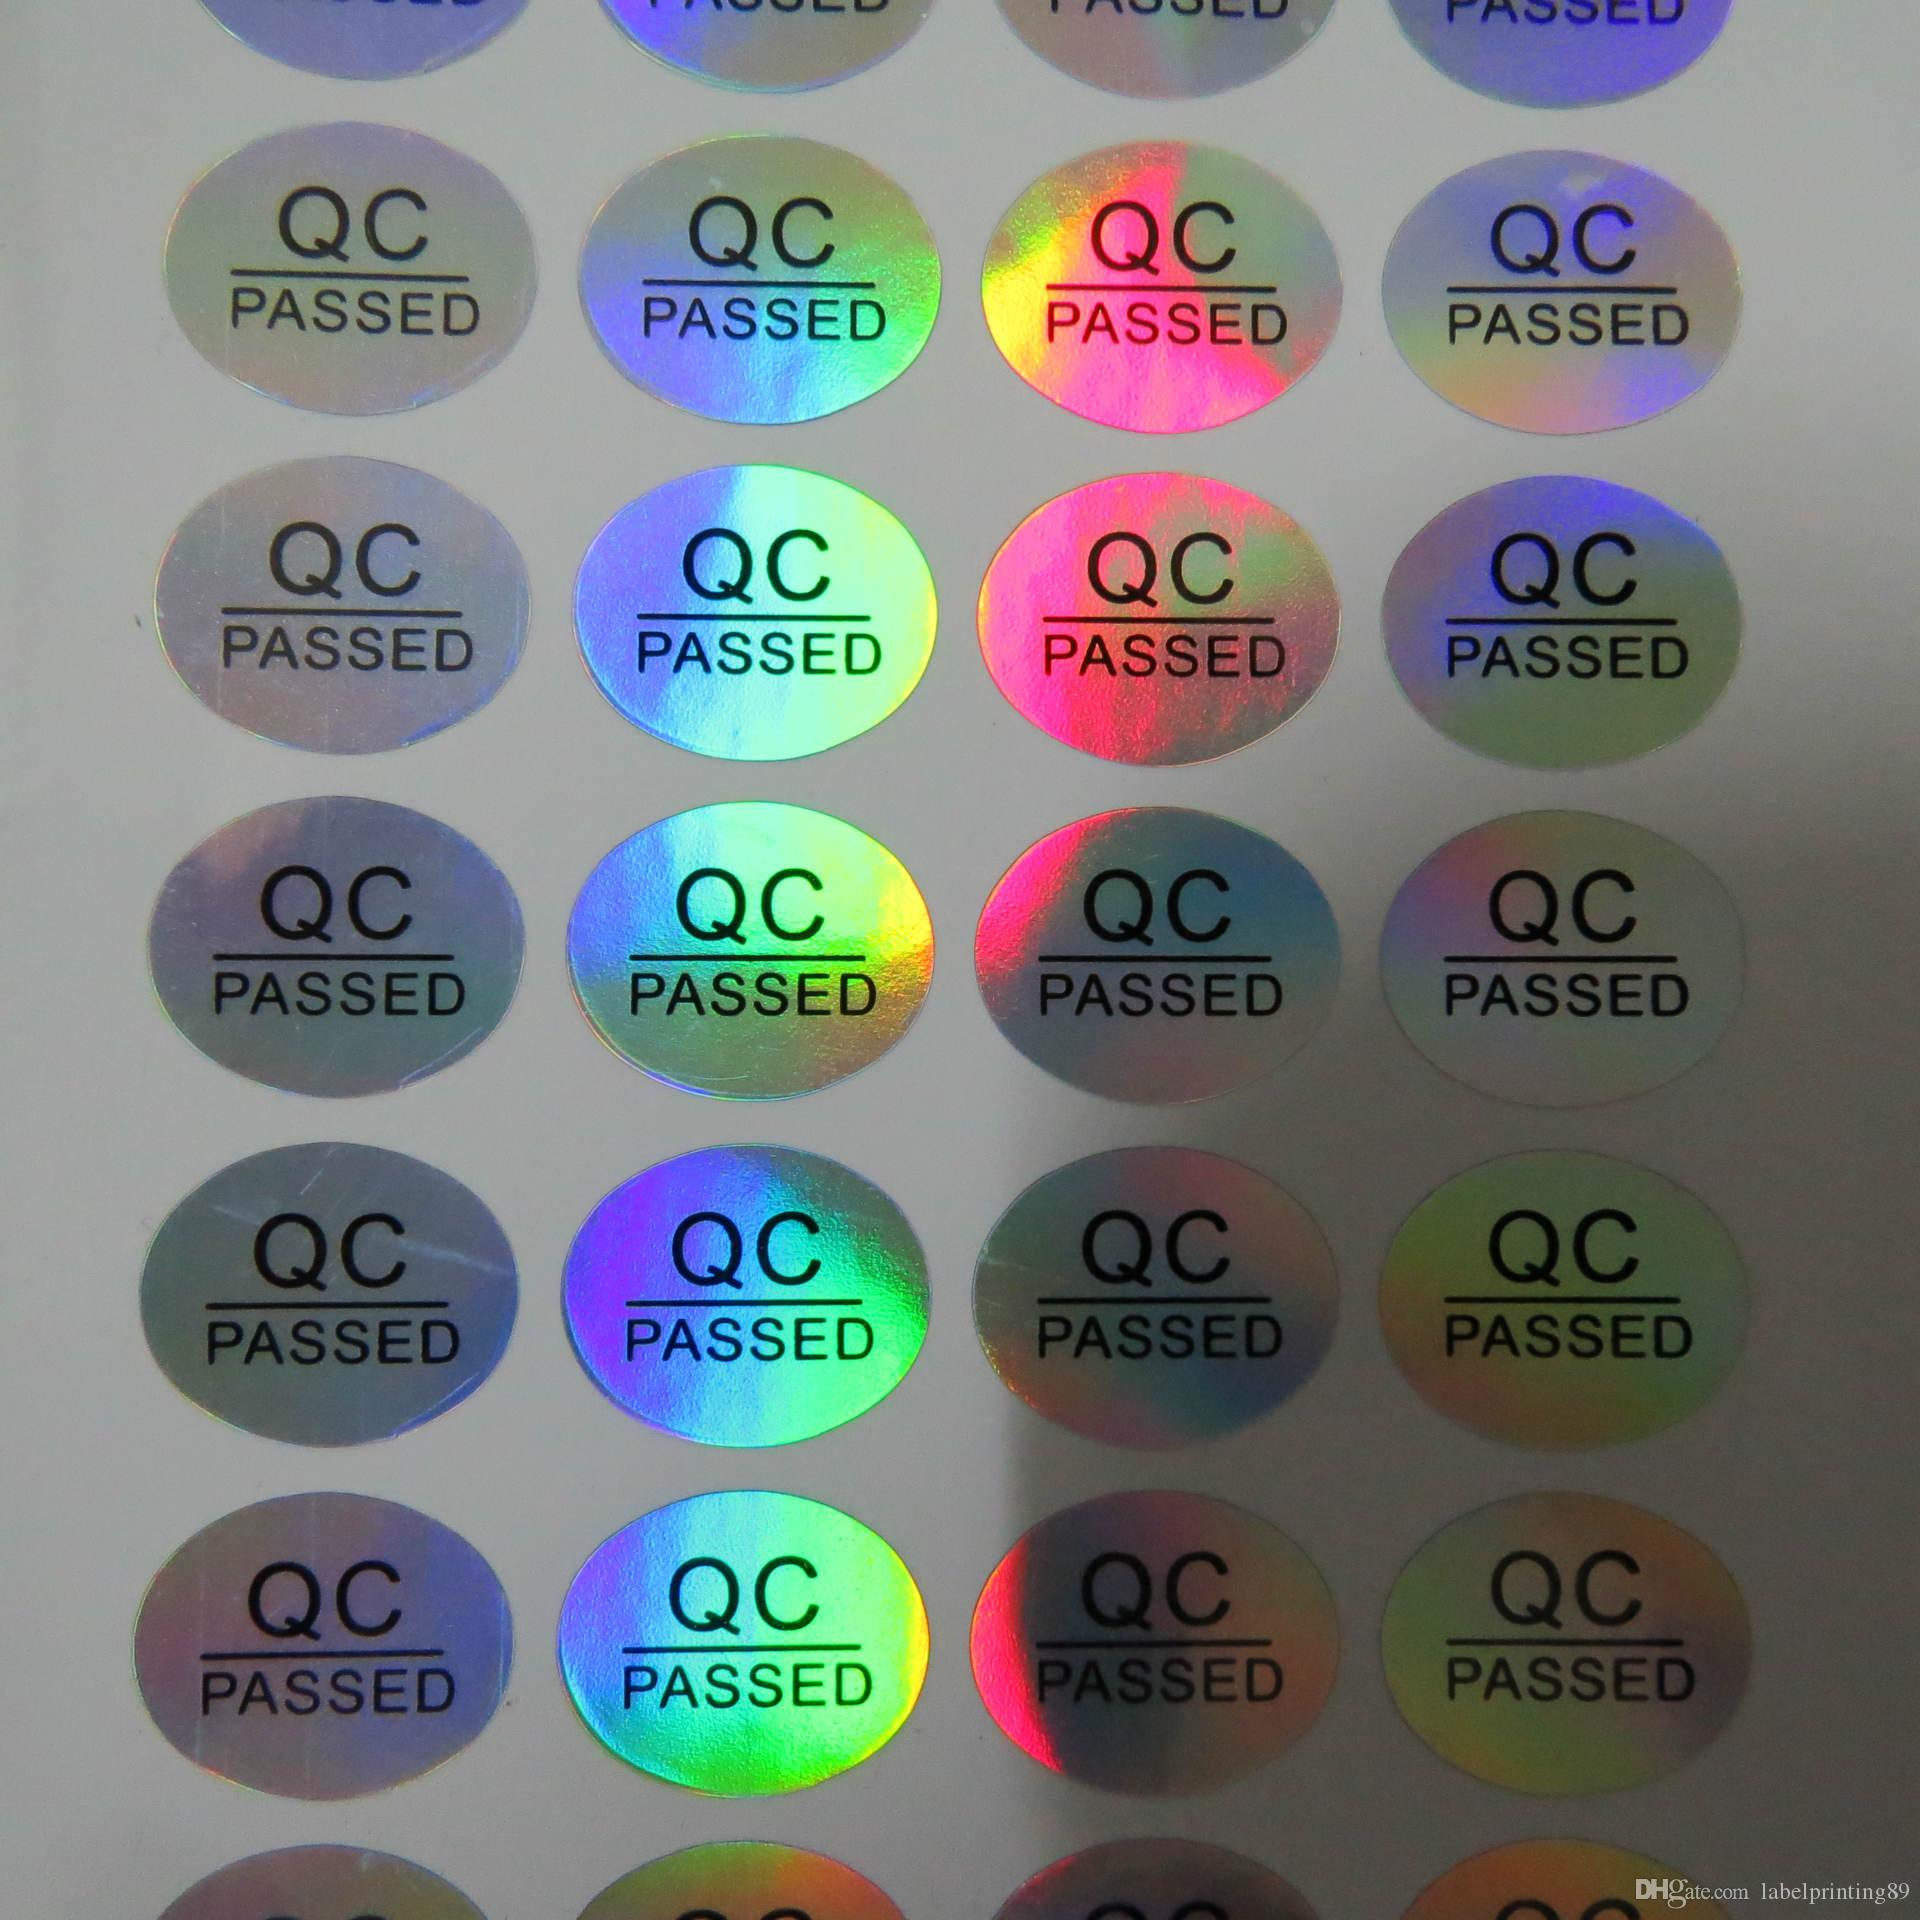 16 * 13mm adesivo permanente rodada QC PASSOU selo garrafa anti-falso holograma etiqueta autoadesiva etiqueta oval rótulo holográfico colorido